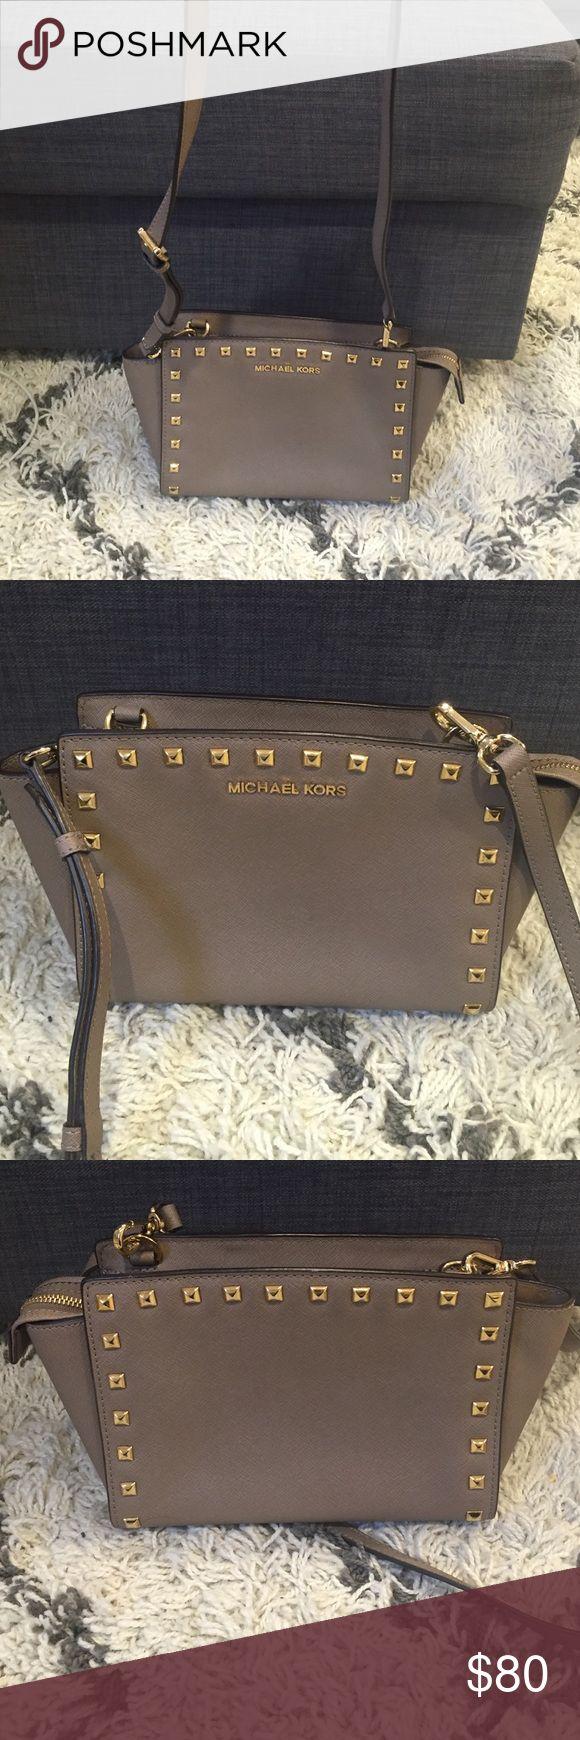 Michael Kors Salma Handbag Gorgeous Michael Kors Salma crossbody Handbag. Gold stud detail and hardware. Top zip closure with one pocket in interior. Adjustable strap. MICHAEL Michael Kors Bags Crossbody Bags